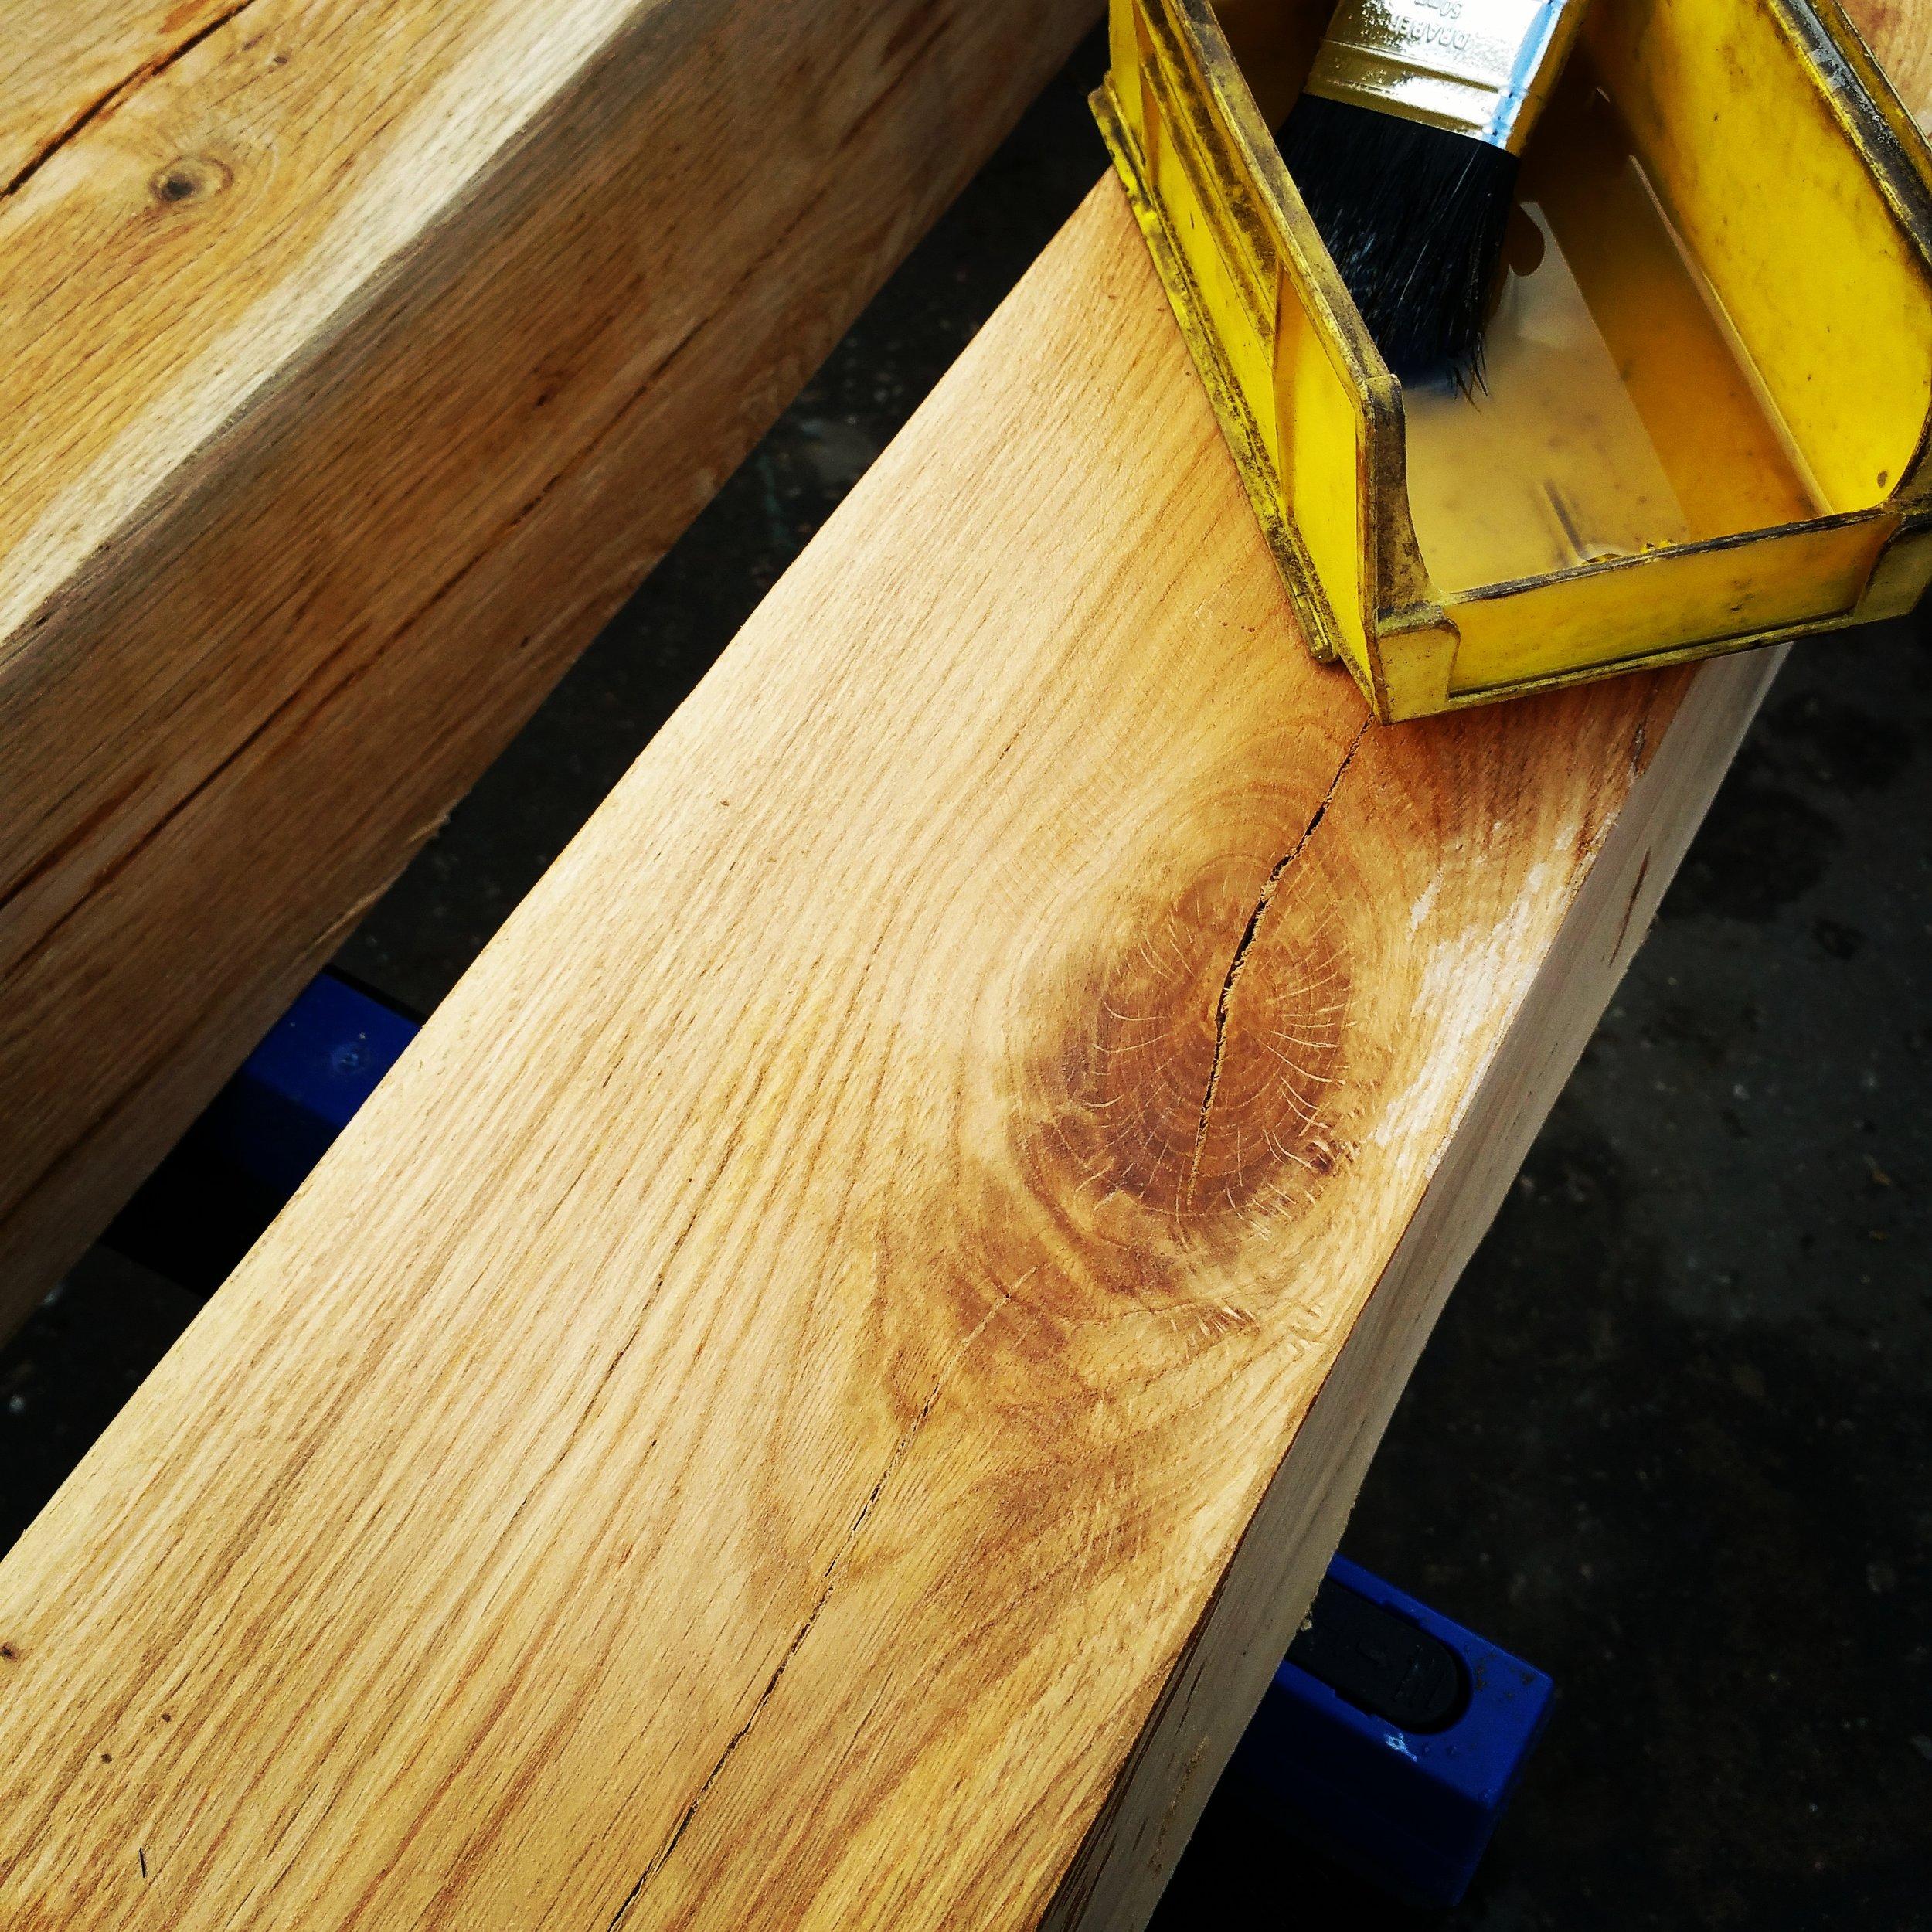 Treating oak